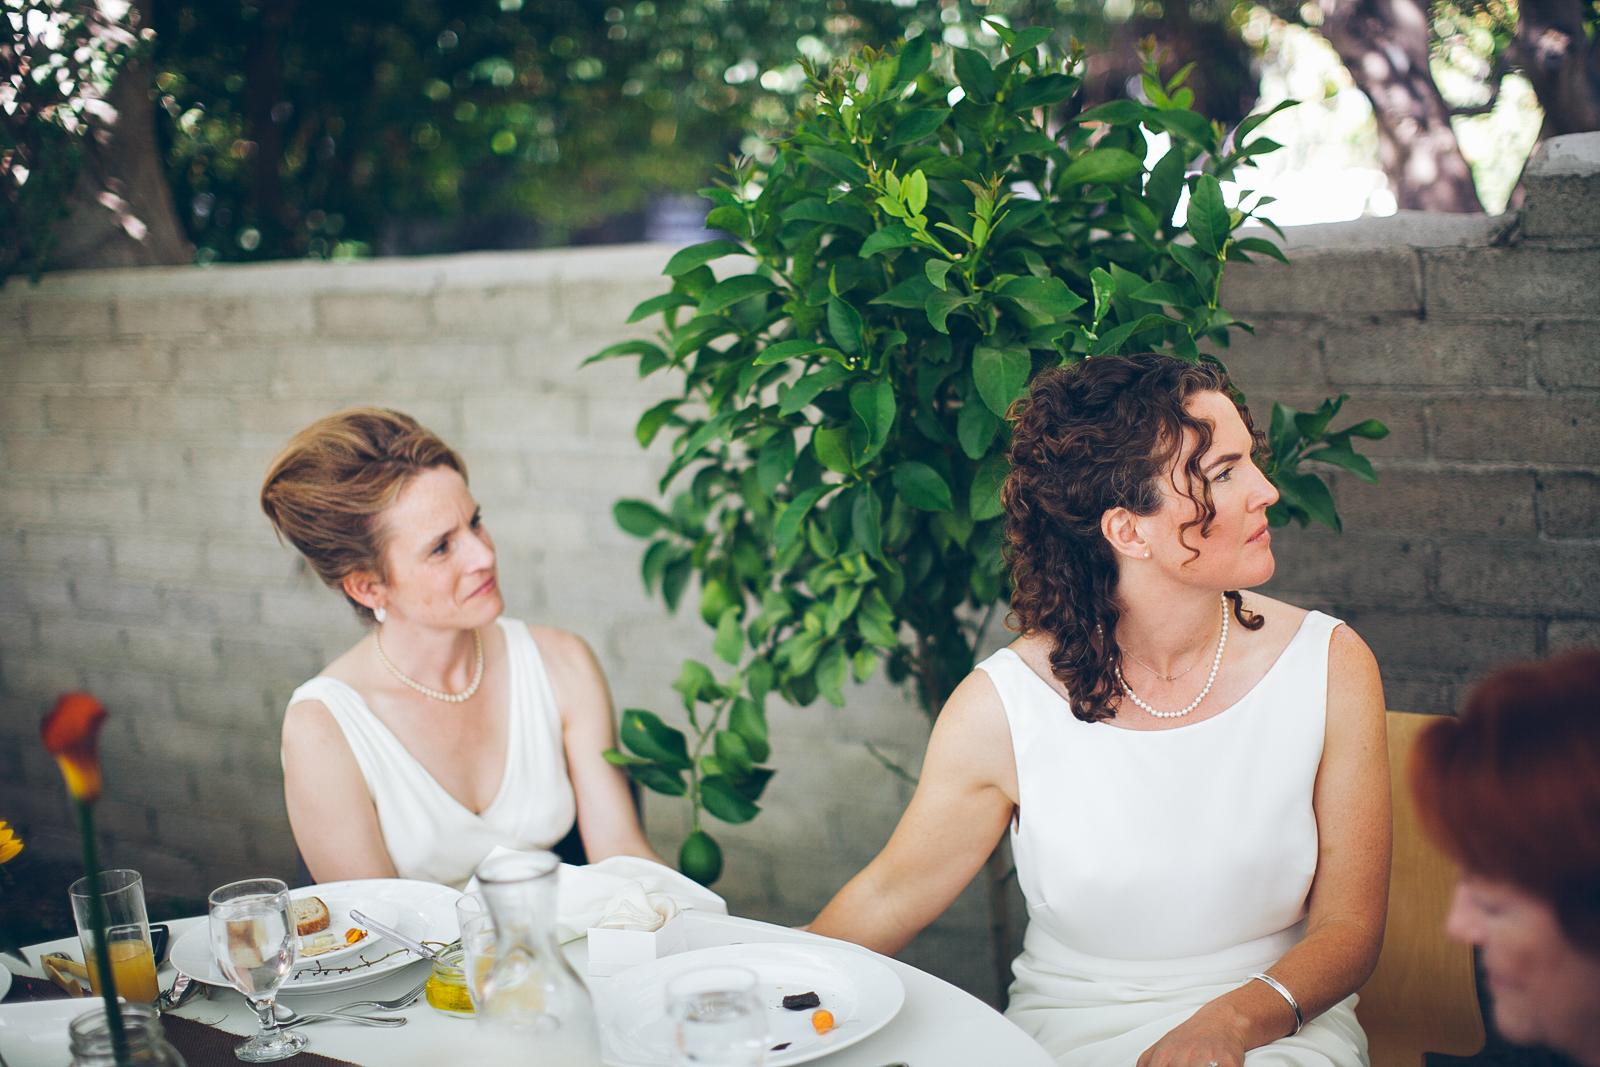 Riverside_ca_wedding_photography_marguerite_carolyn_ebony_siovhan_bokeh_photography_54.jpg